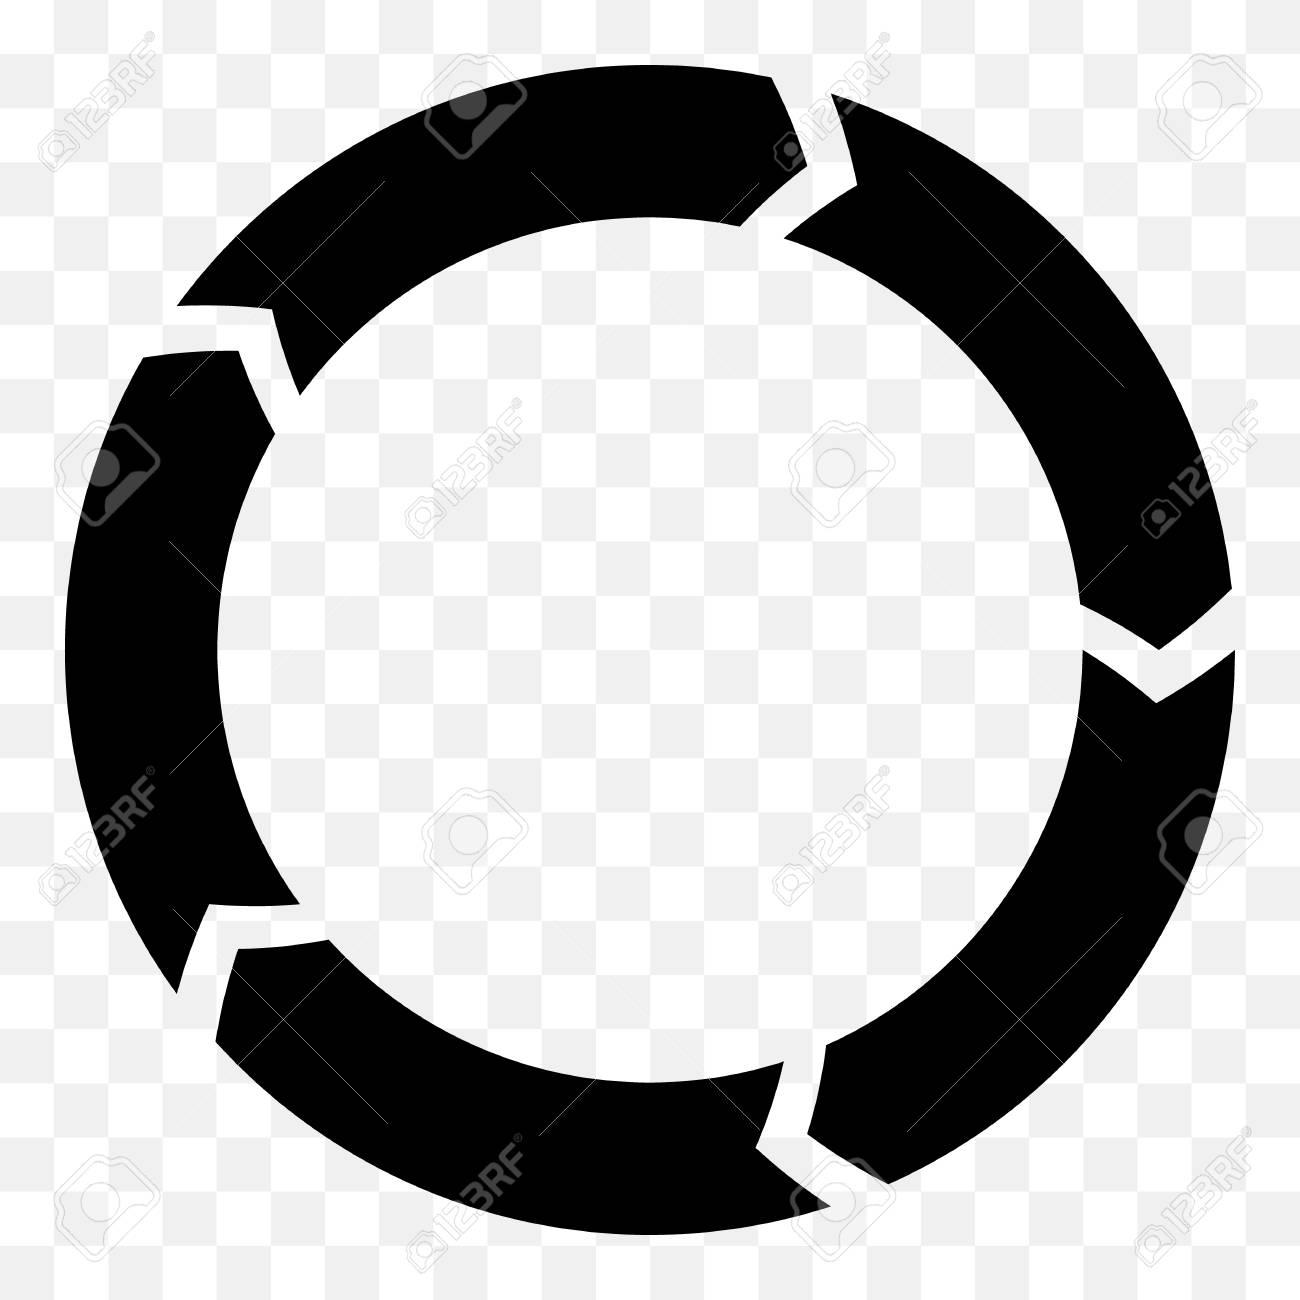 segmented circle arrow circular arrow icon process progres rh 123rf com circle arrow chart vector circle arrow chart vector